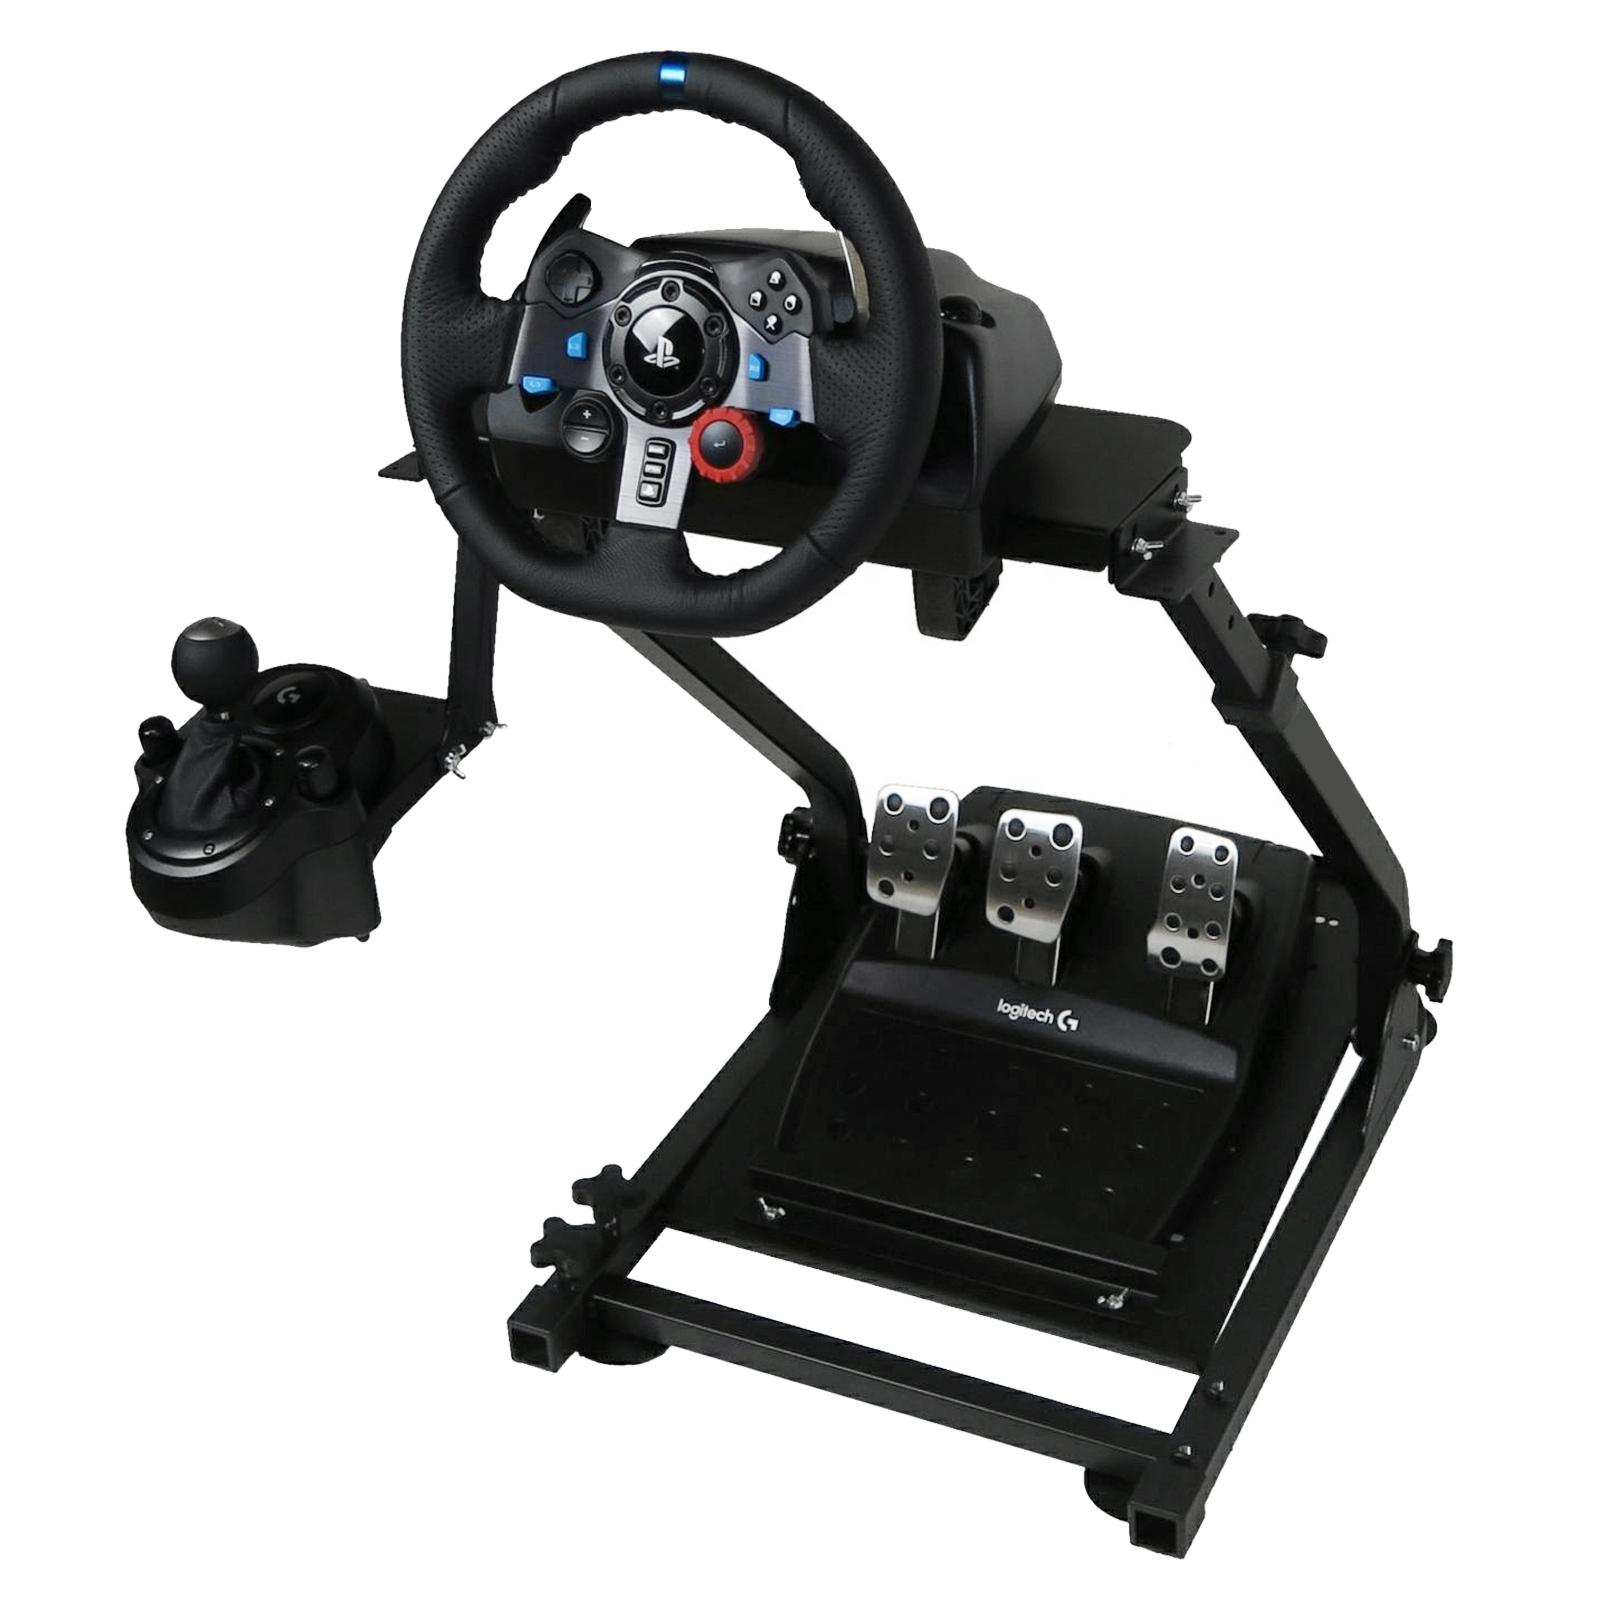 racing racing simulator steering wheel stand for g27 g29. Black Bedroom Furniture Sets. Home Design Ideas